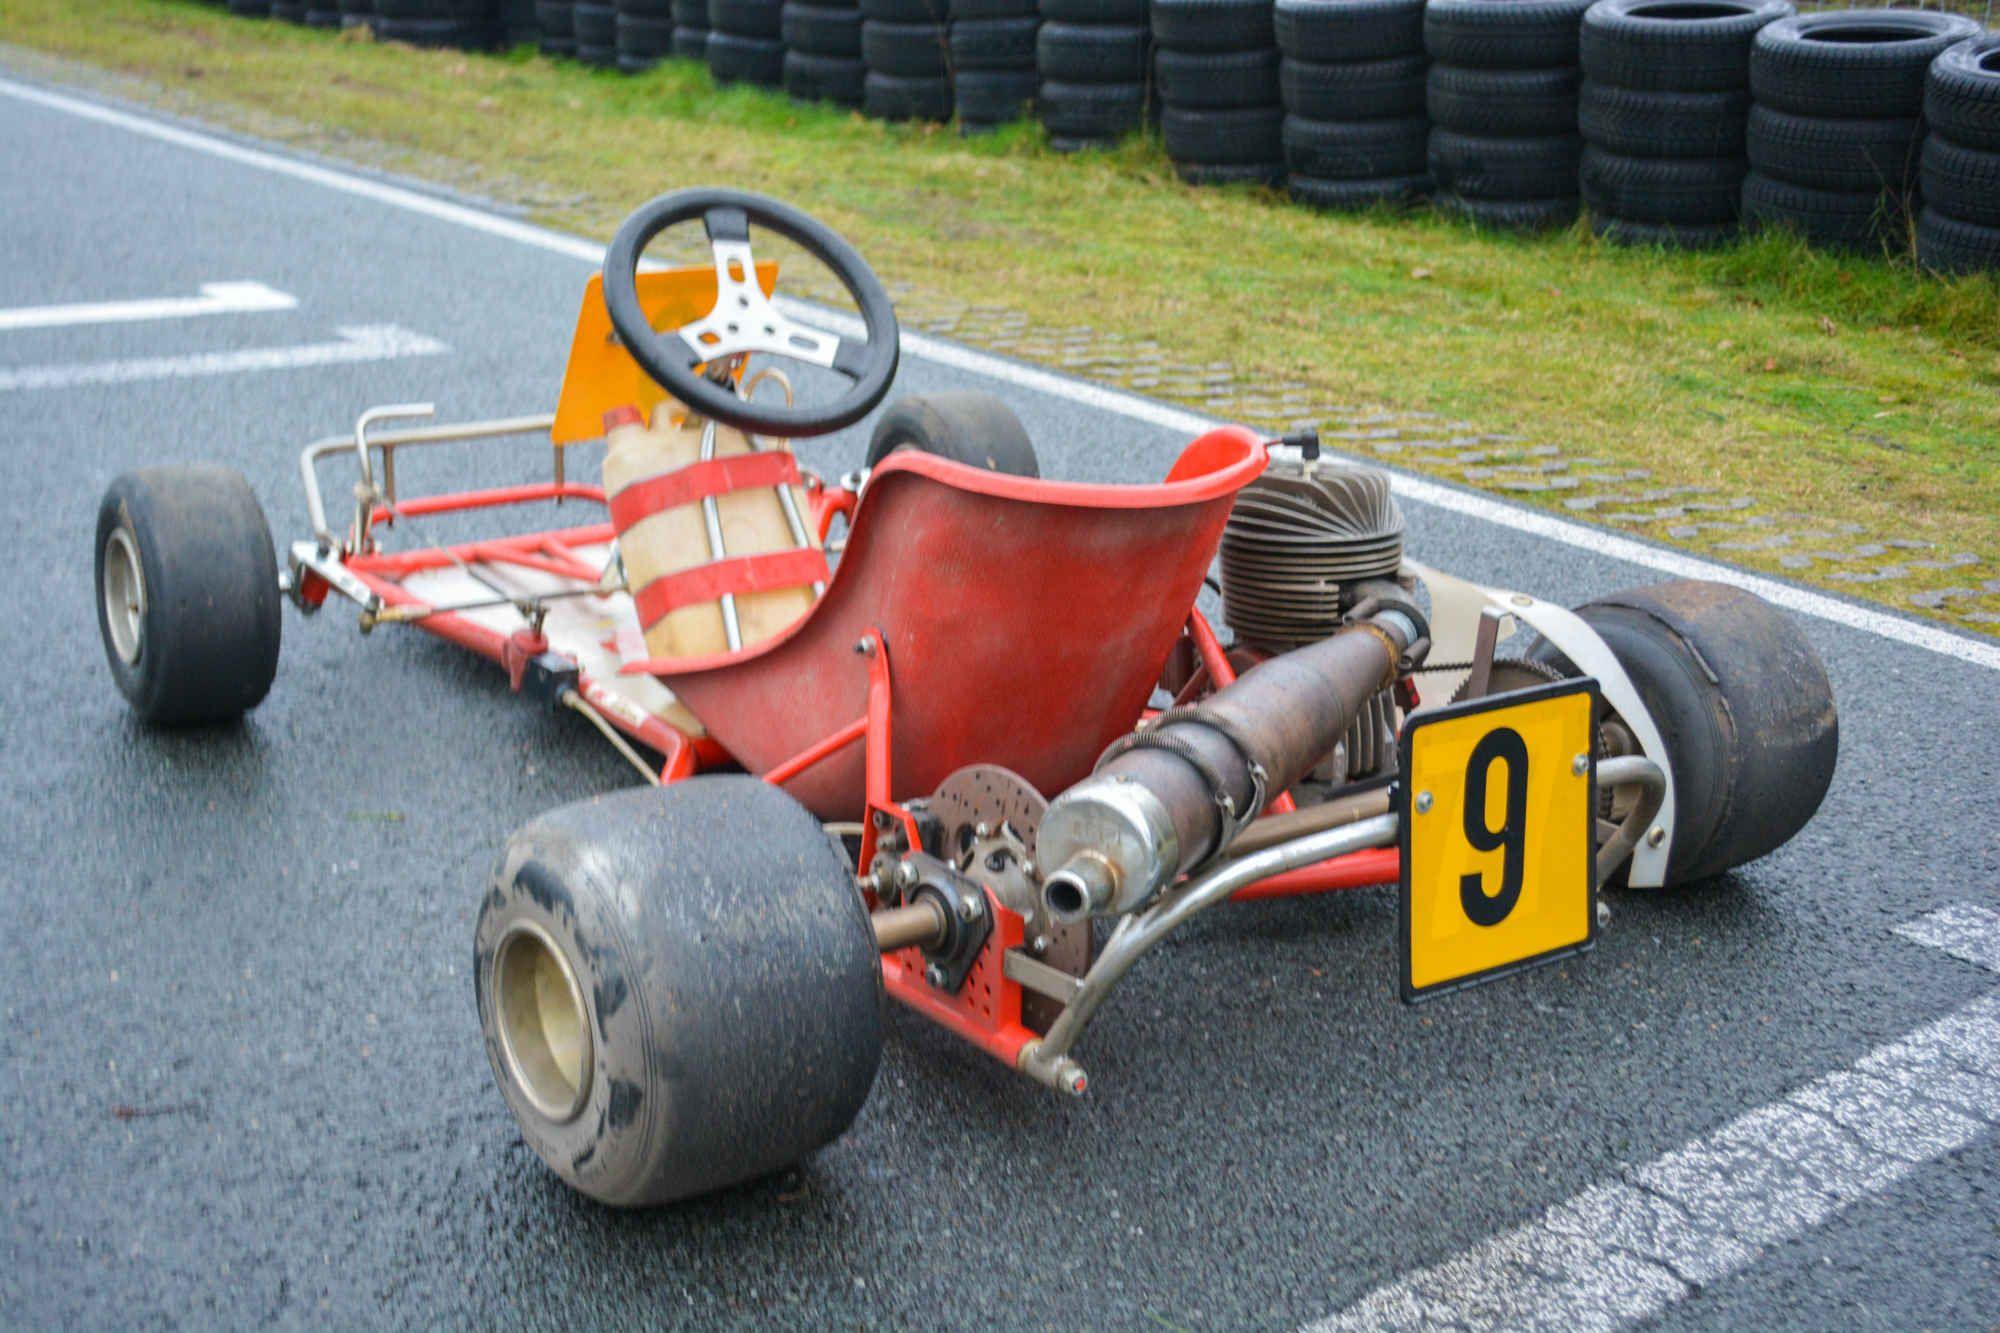 Ayrton Senna\'s Last Go Kart Is For Sale - Supercompressor.com ...